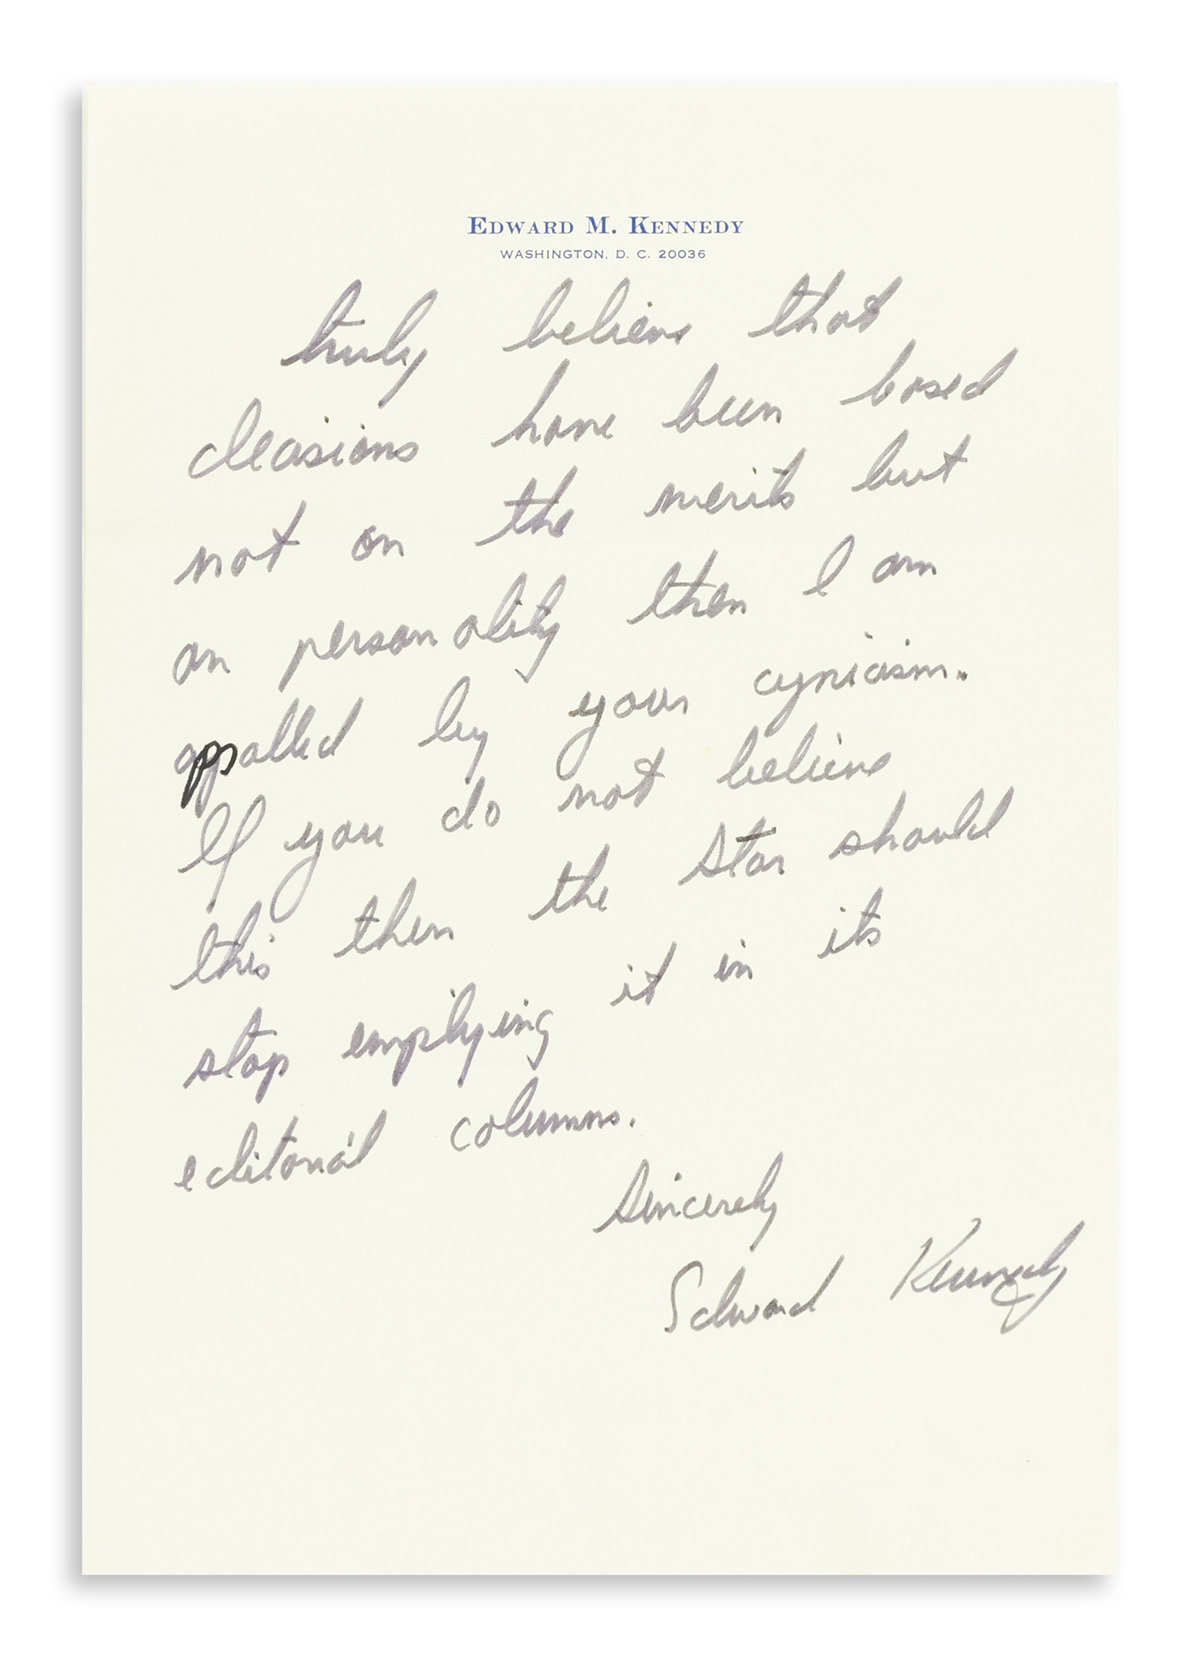 KENNEDY-EDWARD-M-Three-letters-Signed-Edward-Kennedy-or-Ted-